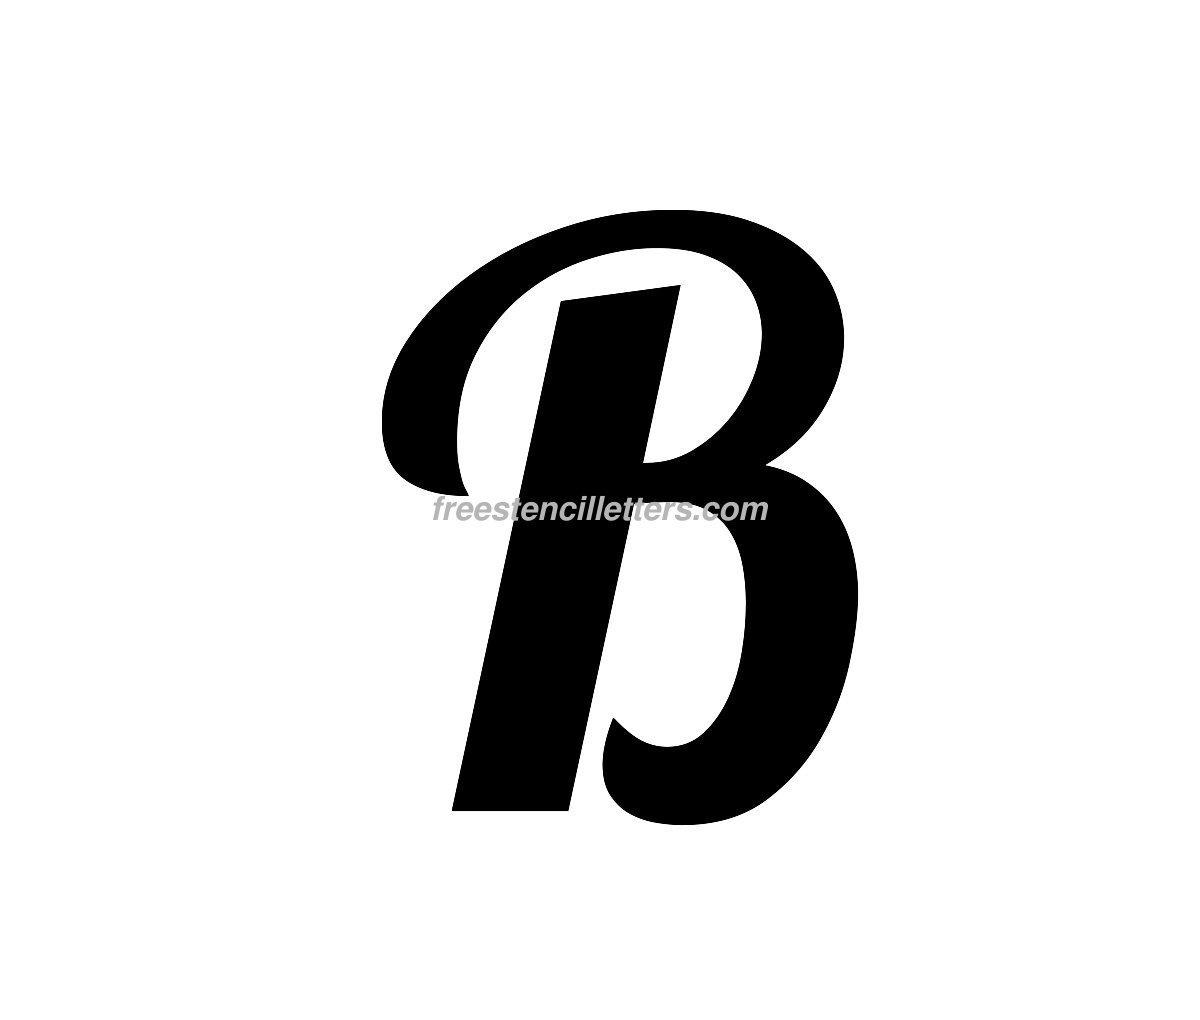 Worksheet Cursuve B 8 best images of printable letter stencil b free pumpkin stencil